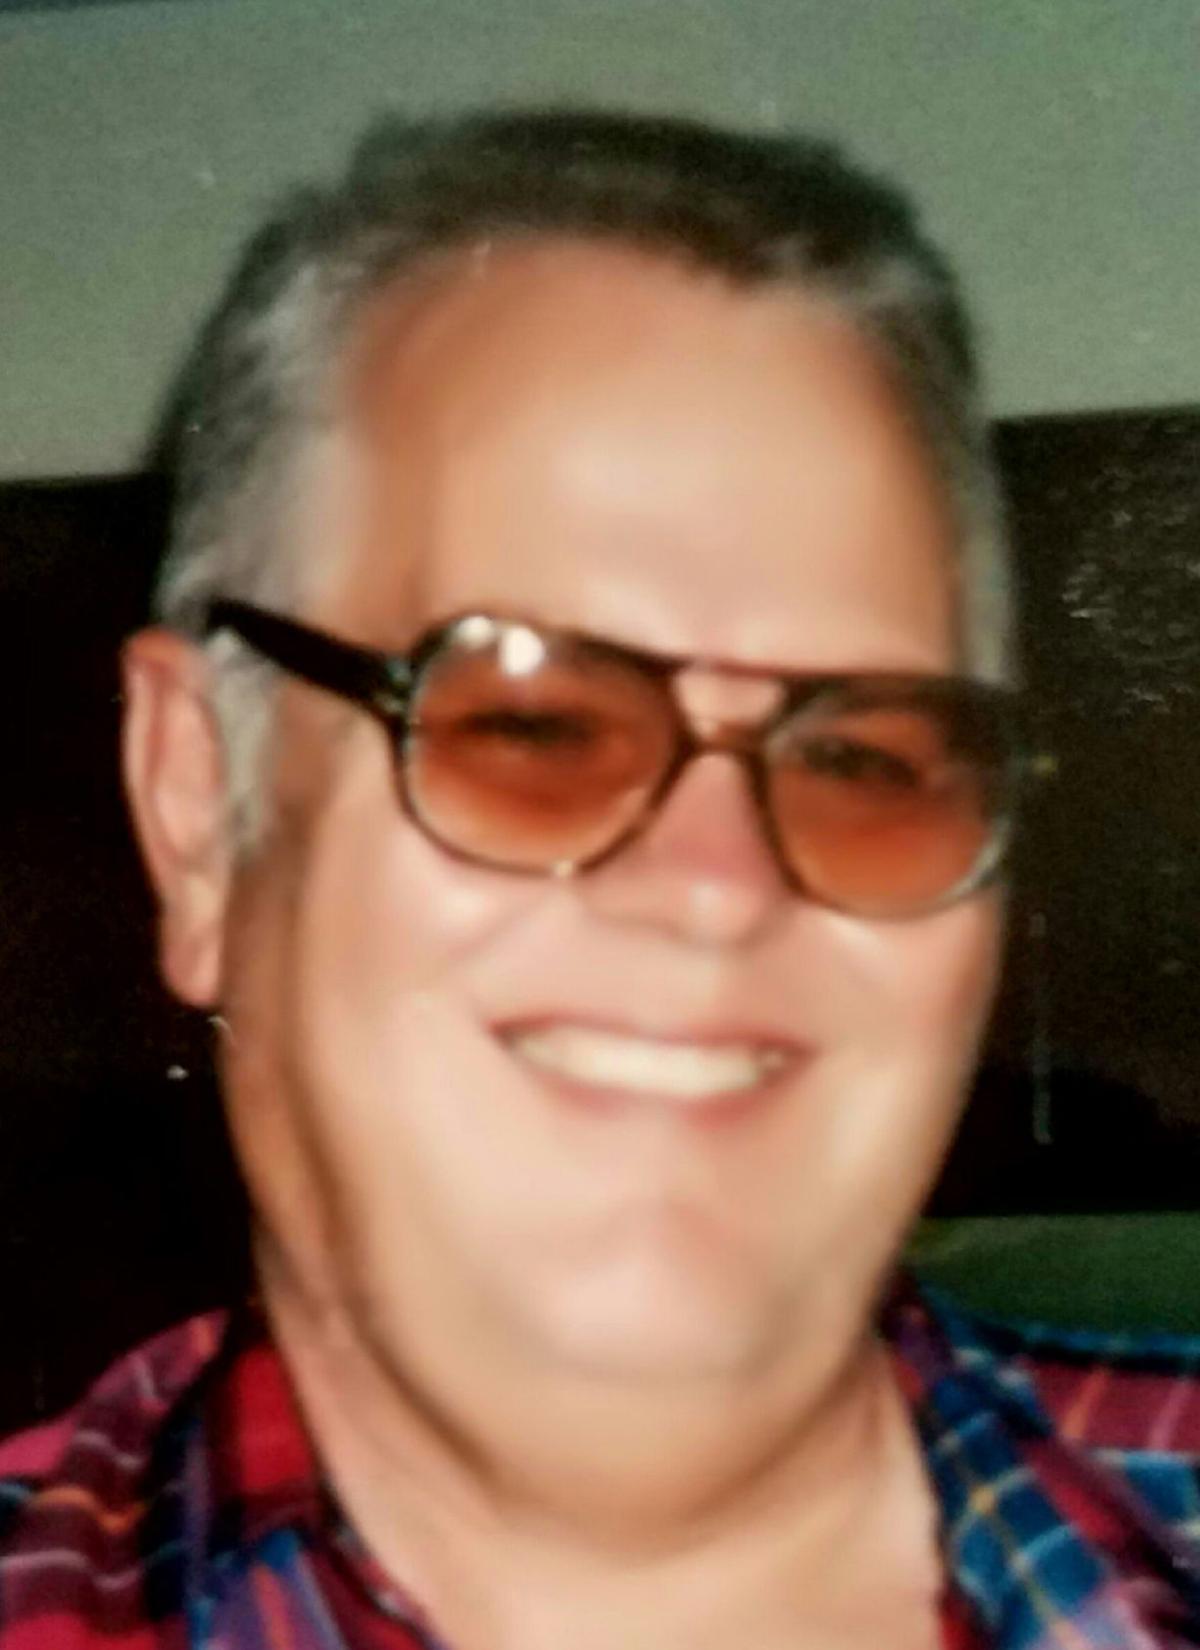 Lawrence B. 'Larry' Forari Jr.